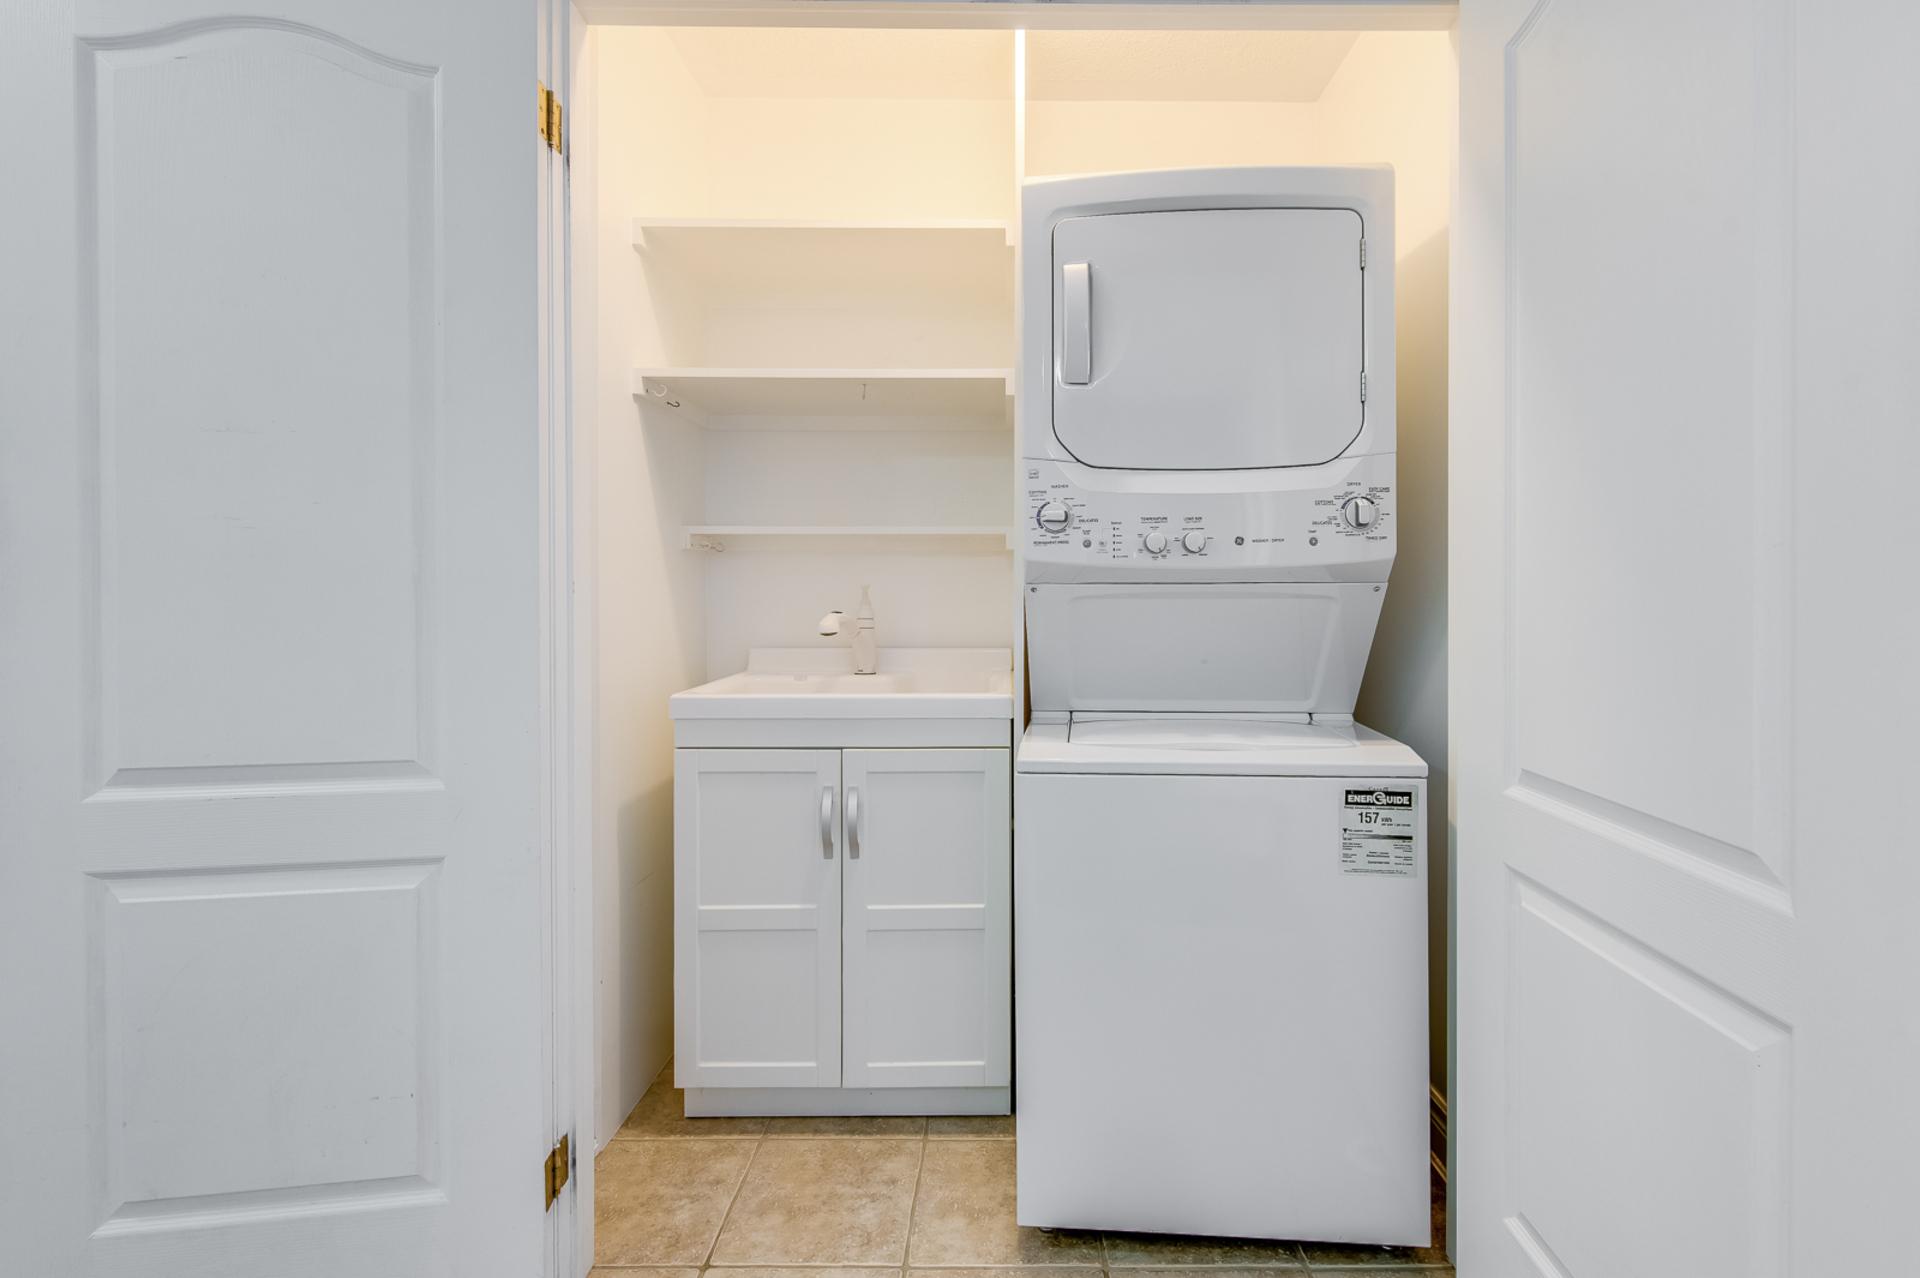 Laundry Room - 2014 Lushes Ave, Mississauga - Elite3 & Team at 2014 Lushes Avenue, Clarkson, Mississauga